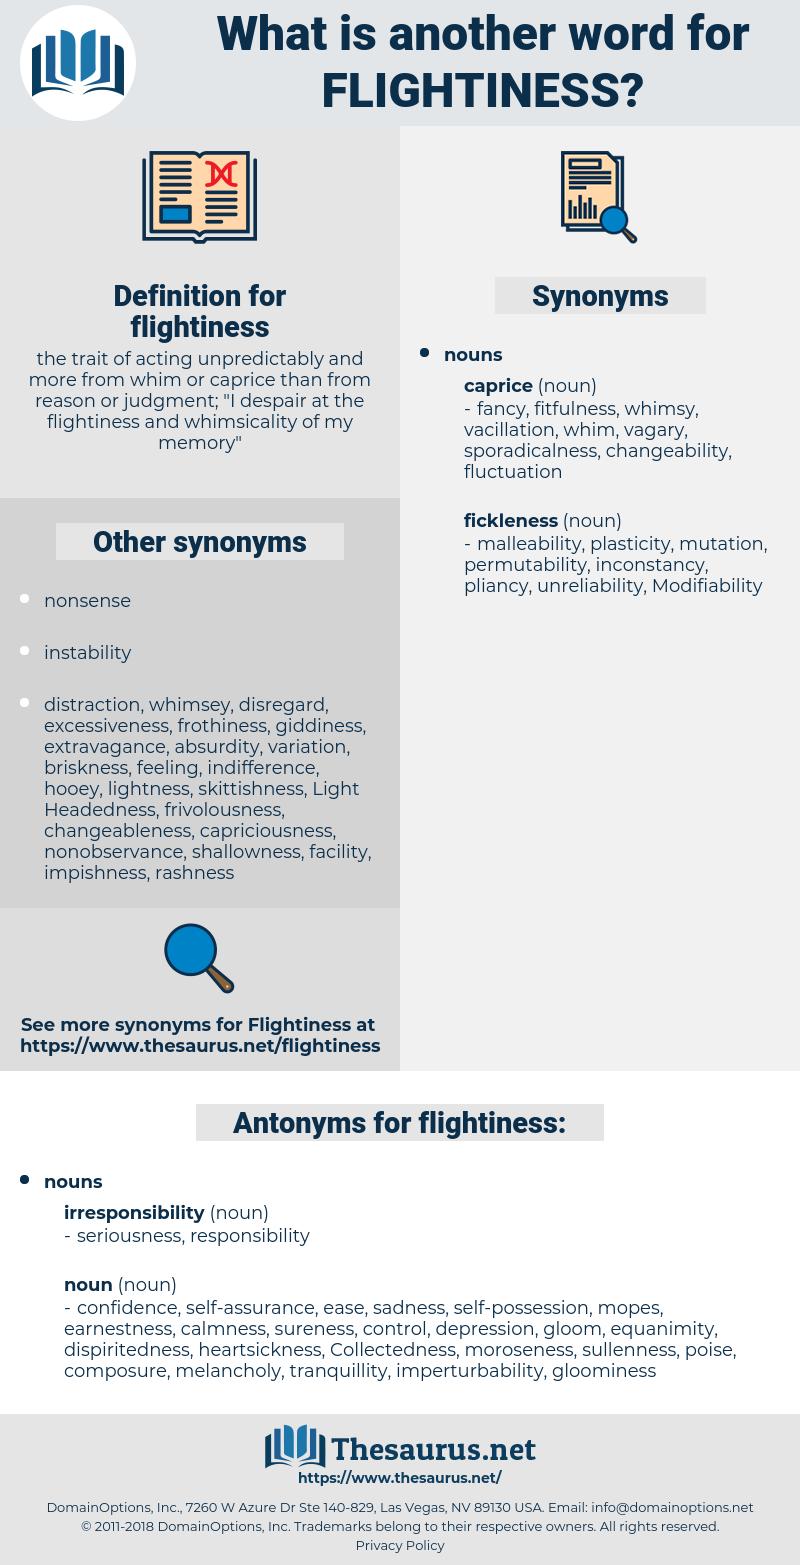 flightiness, synonym flightiness, another word for flightiness, words like flightiness, thesaurus flightiness